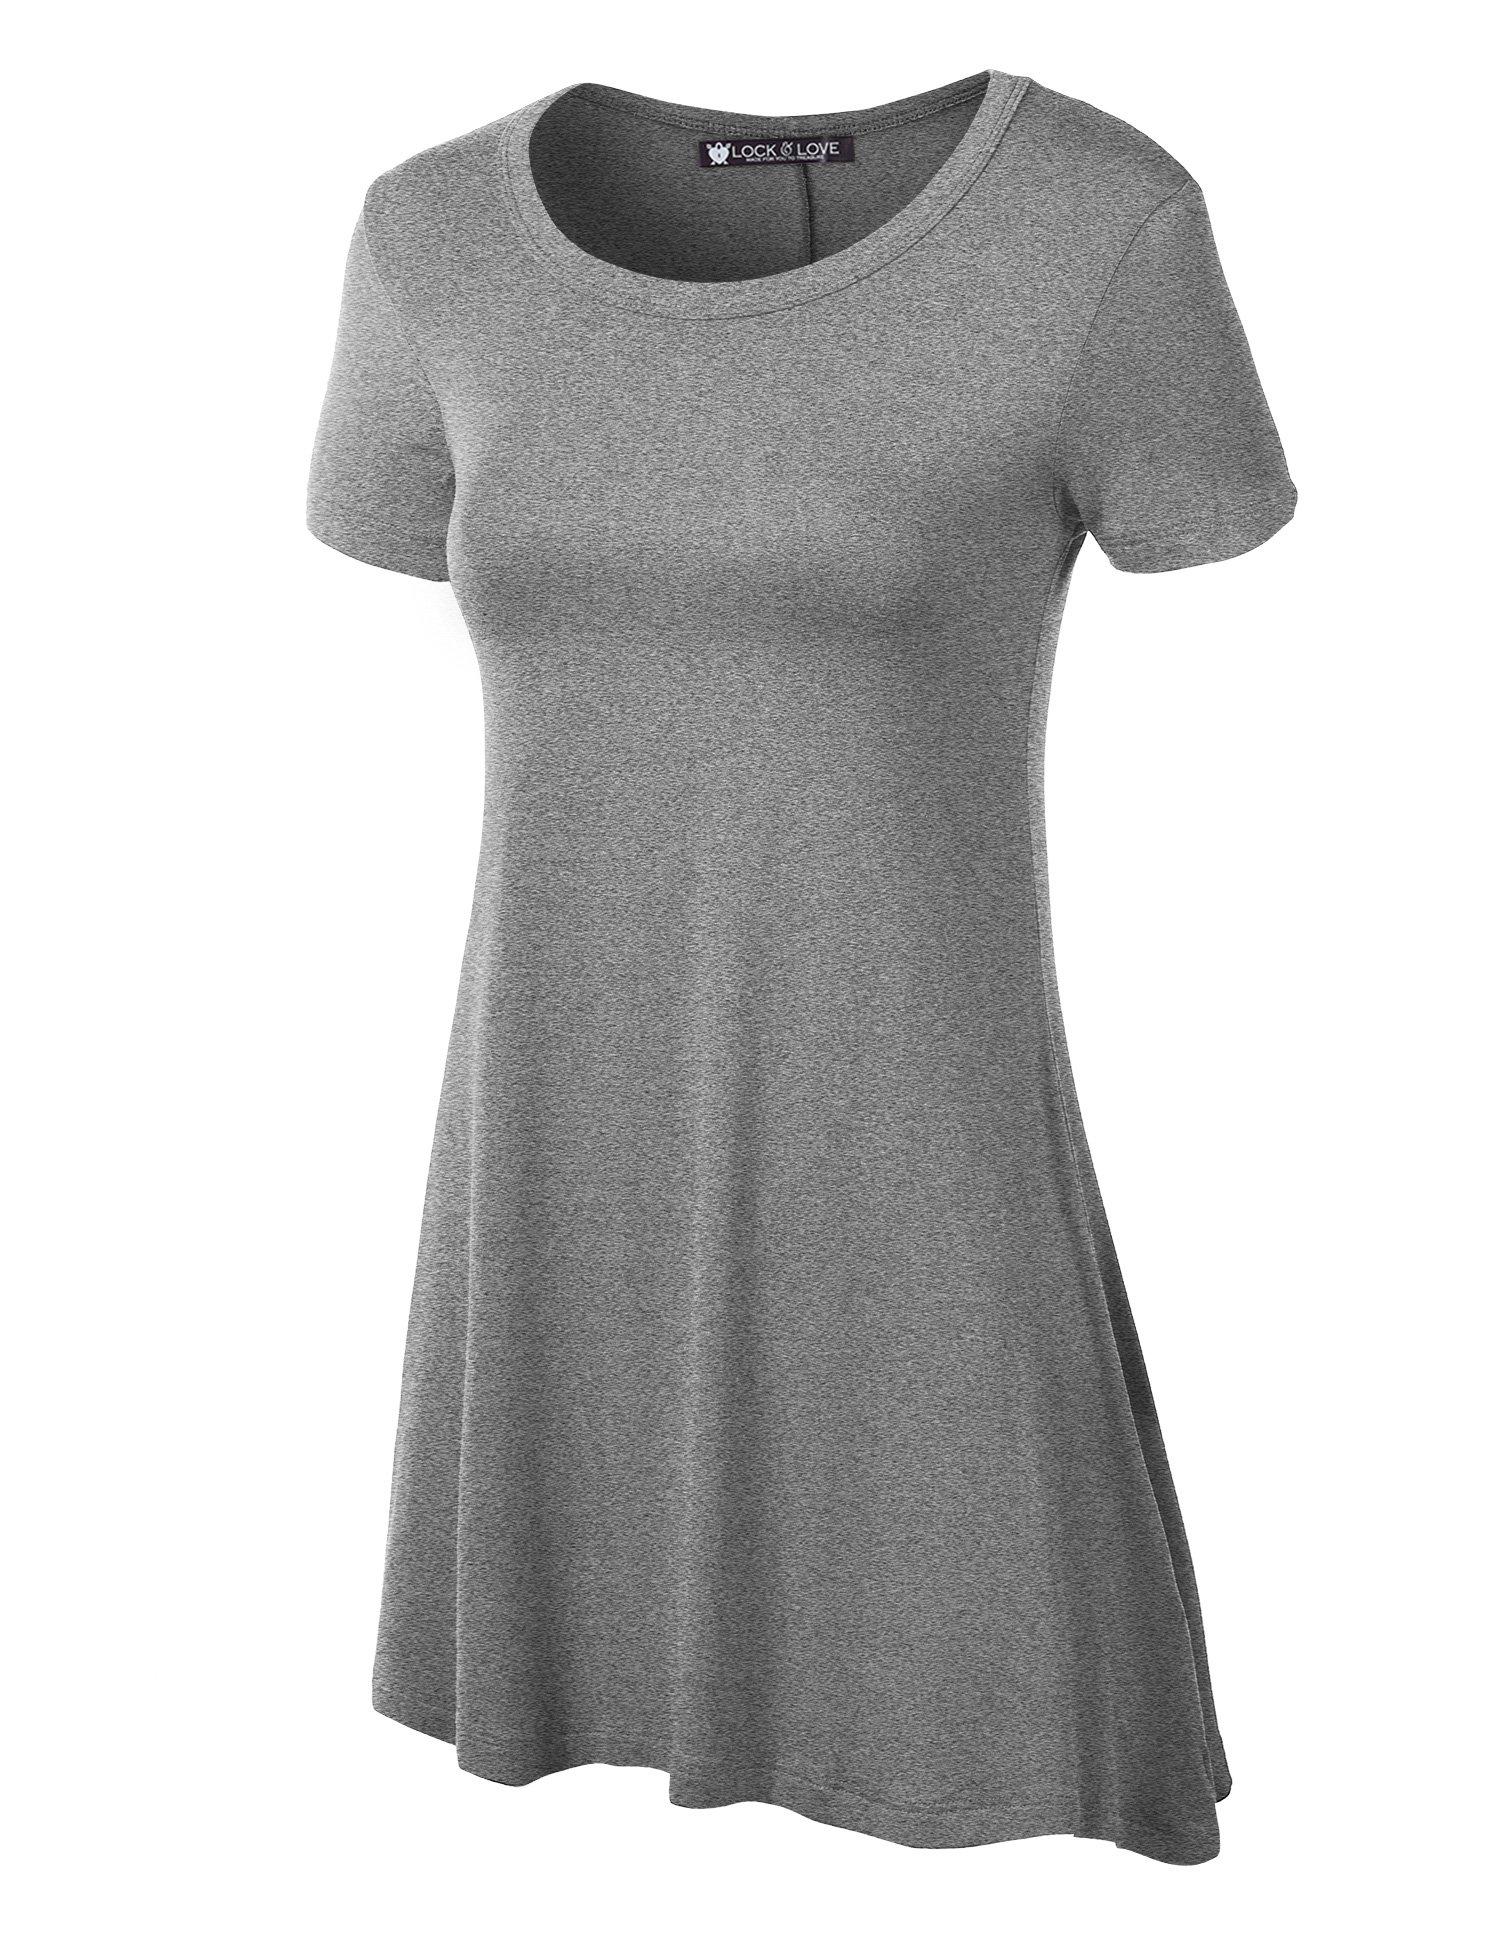 WT770 Womens Short Sleeve Handkerchief Hem Tunic XXL Heather_Grey